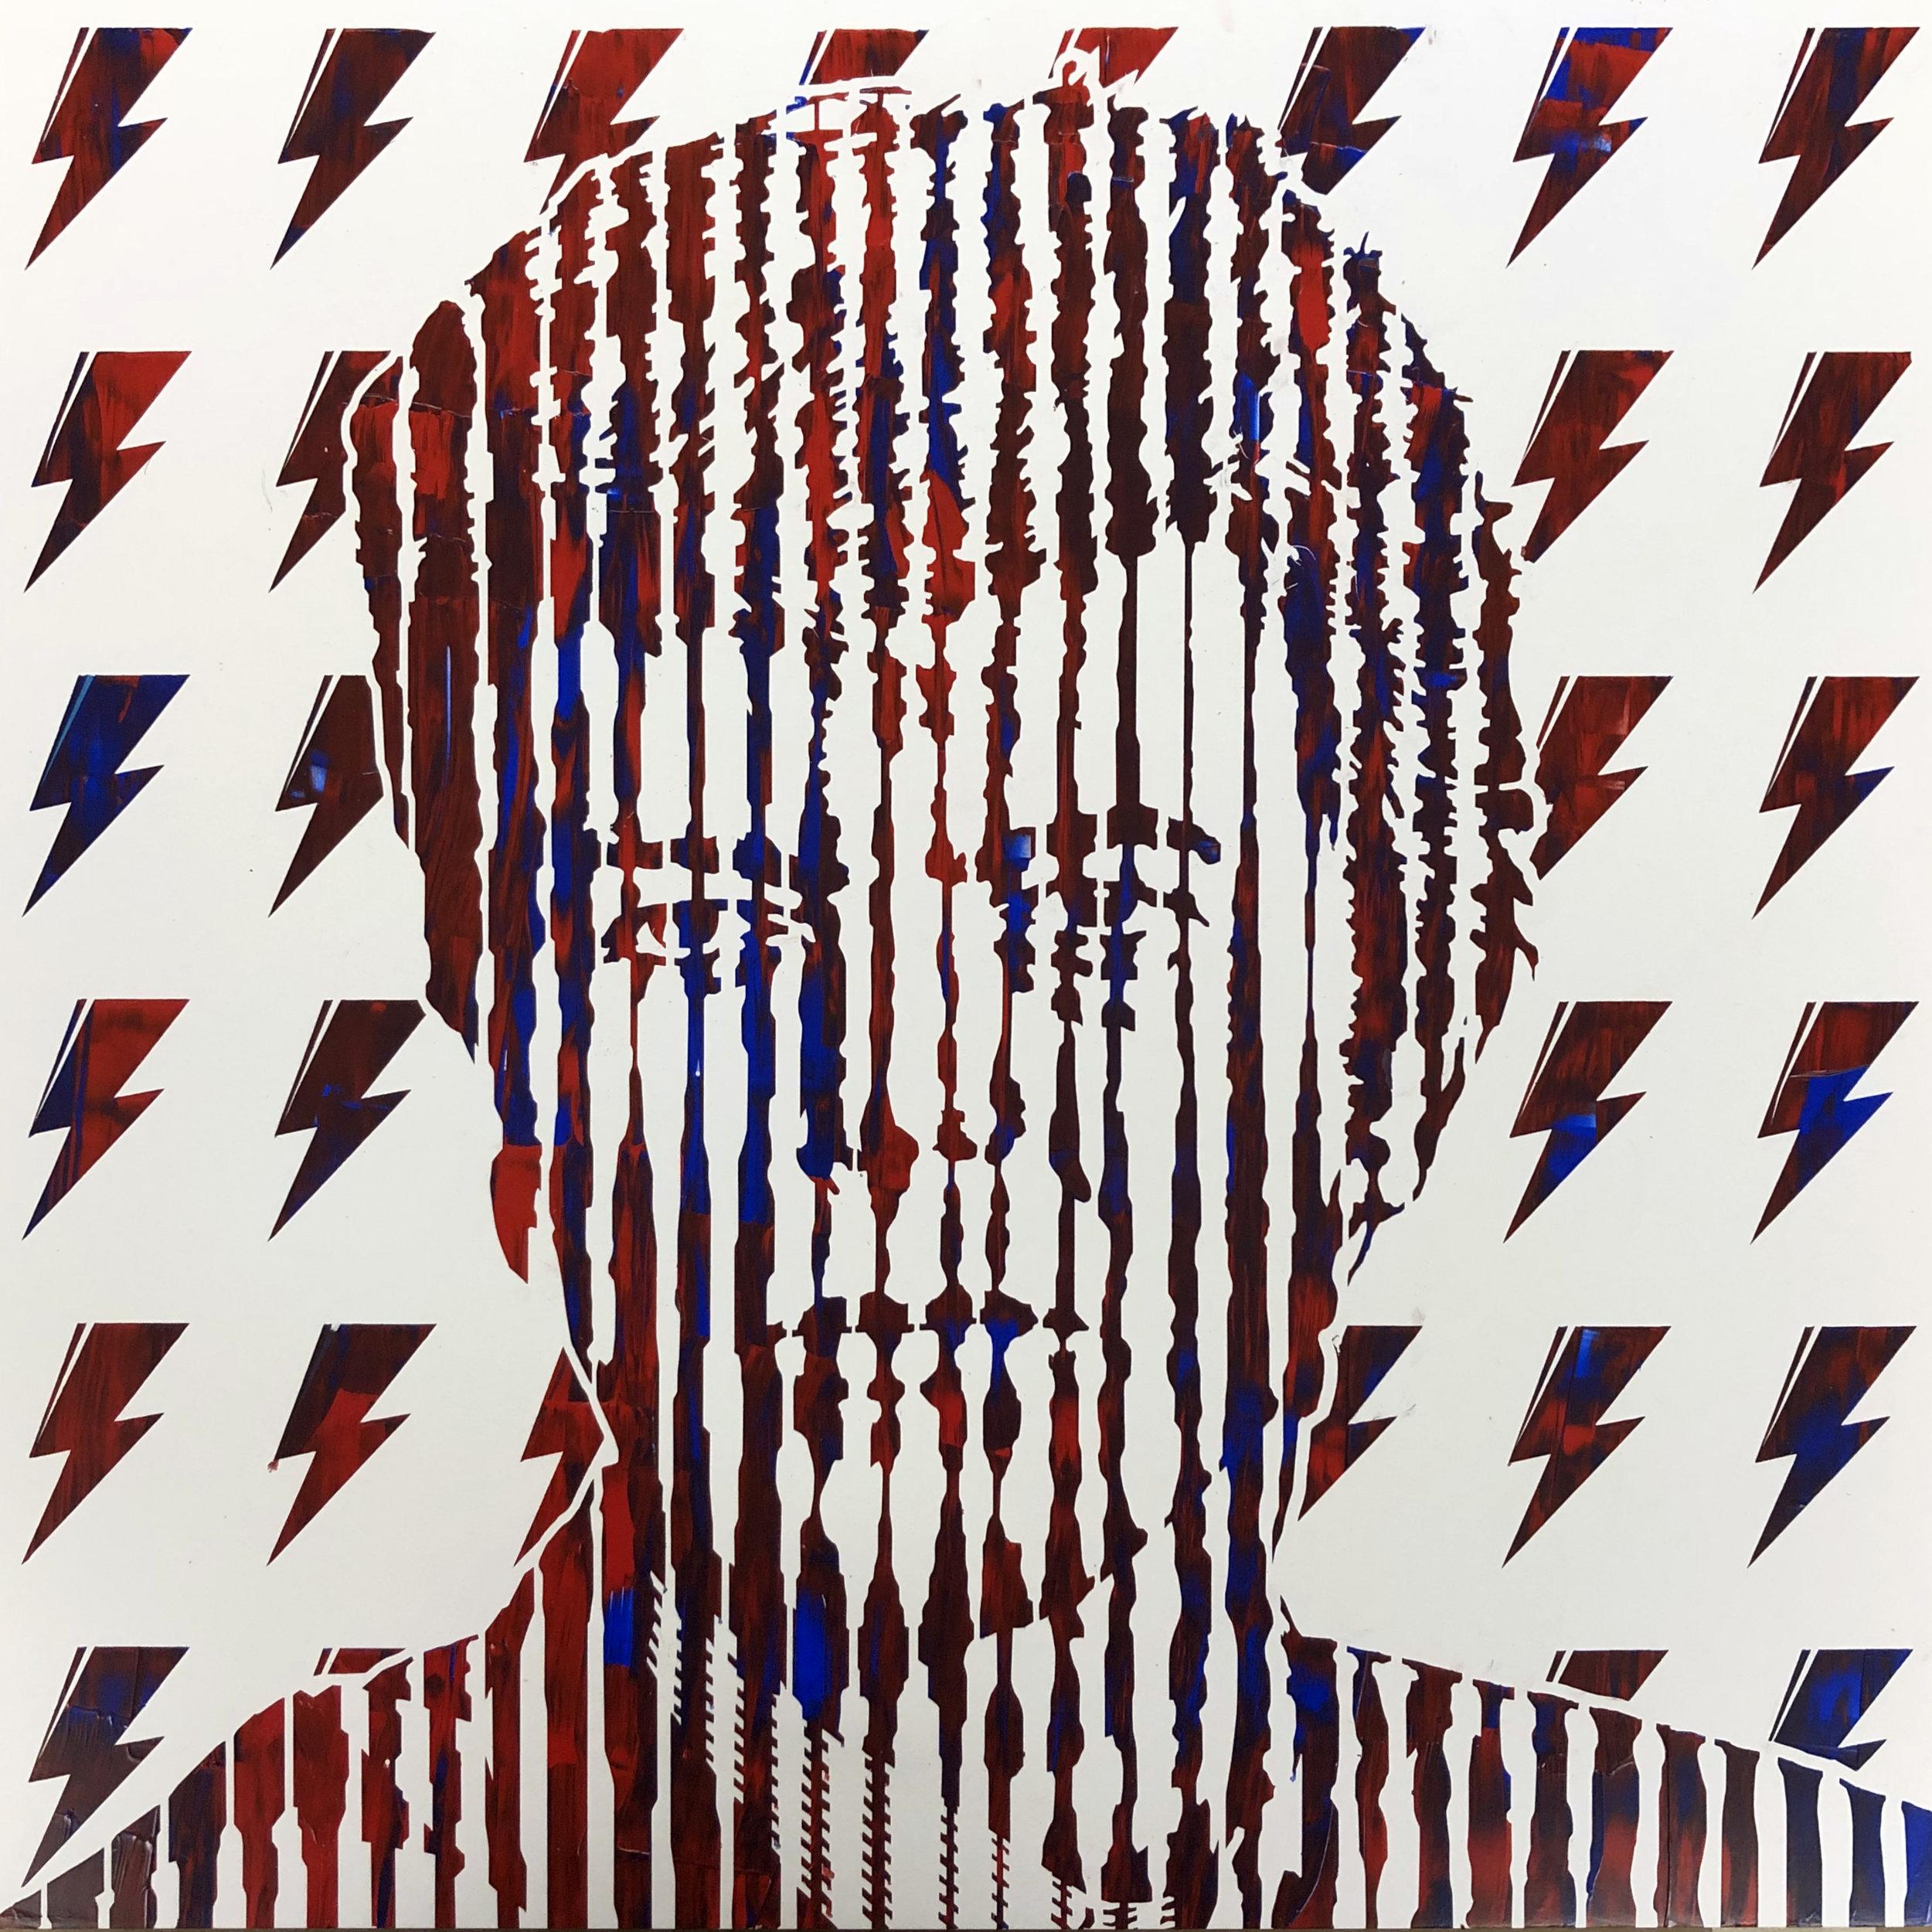 Sean Christopher Ward - Bowie II - Acrylic on Wood Panel - 16x16x1.5 - 2018 - 500.jpg